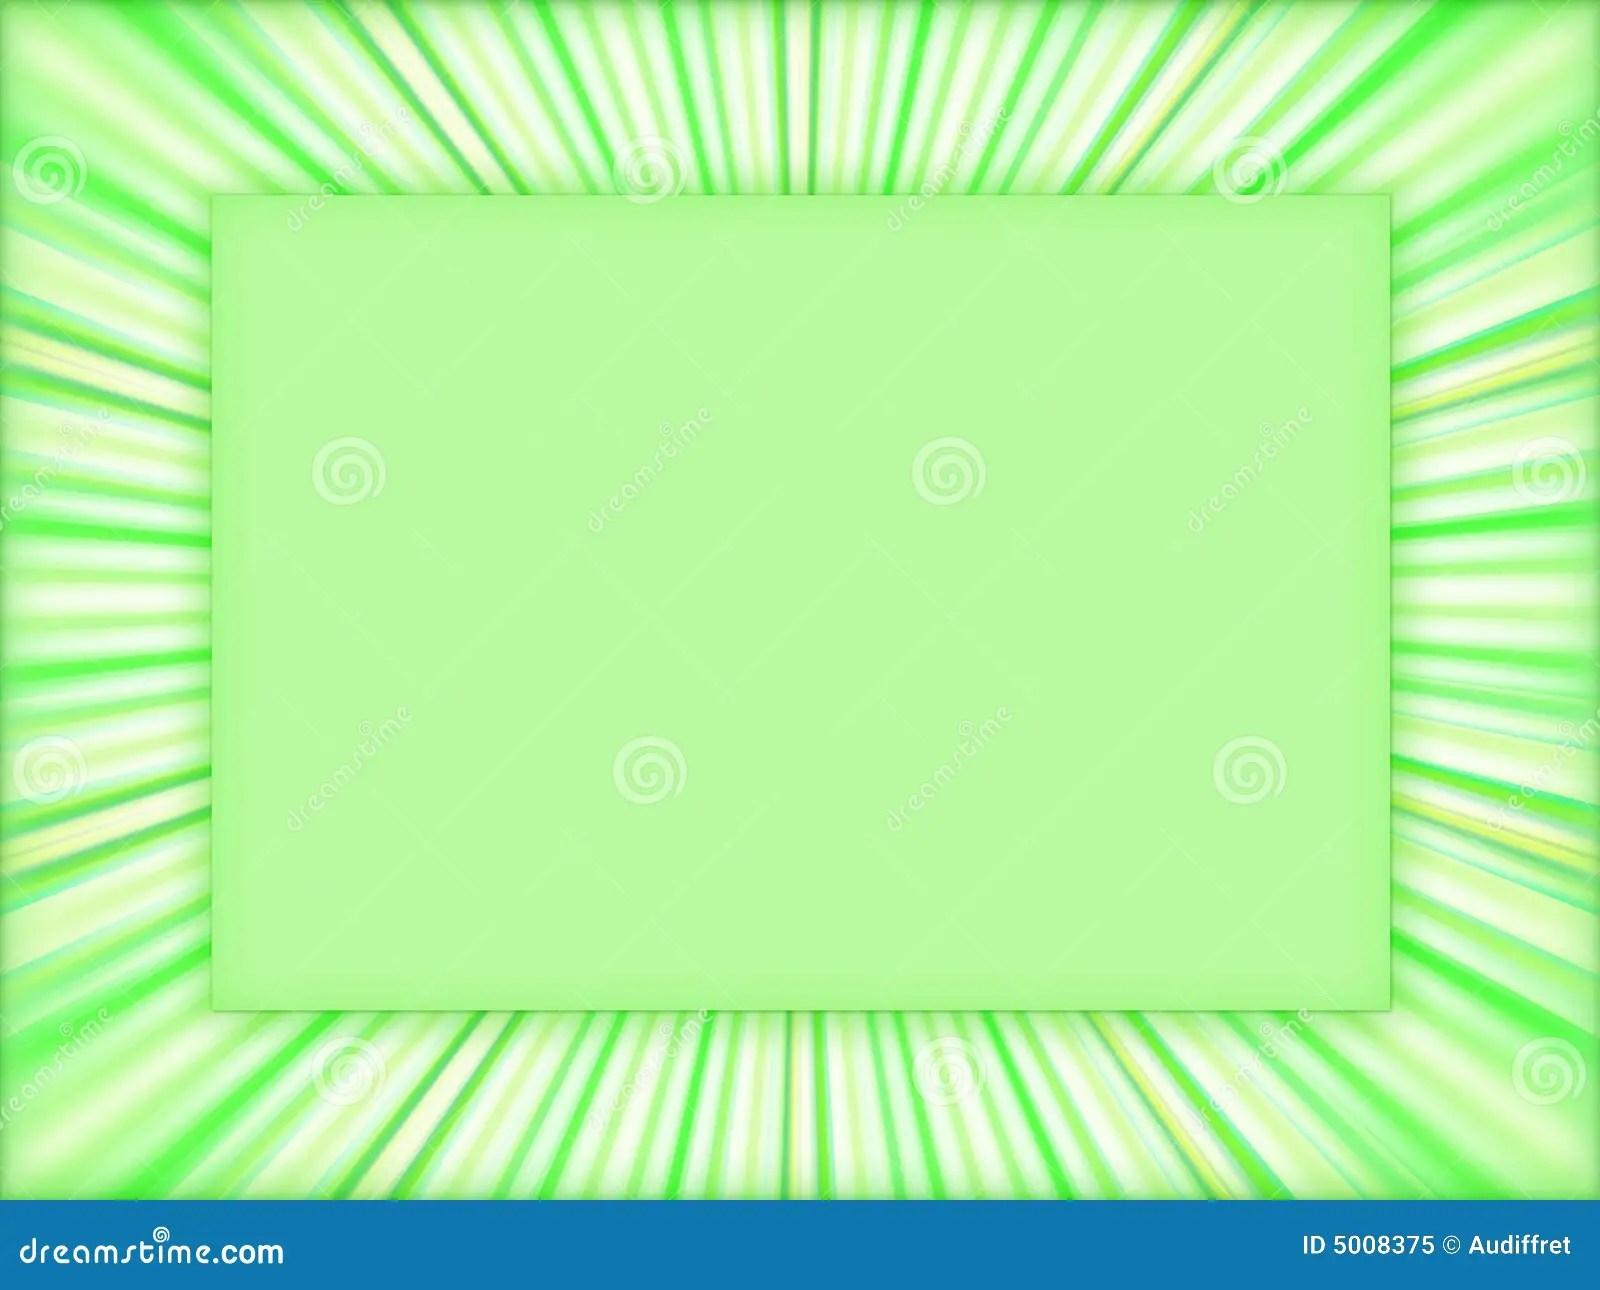 3d All Wallpaper Free Download Green Frame Background Stock Illustration Image Of